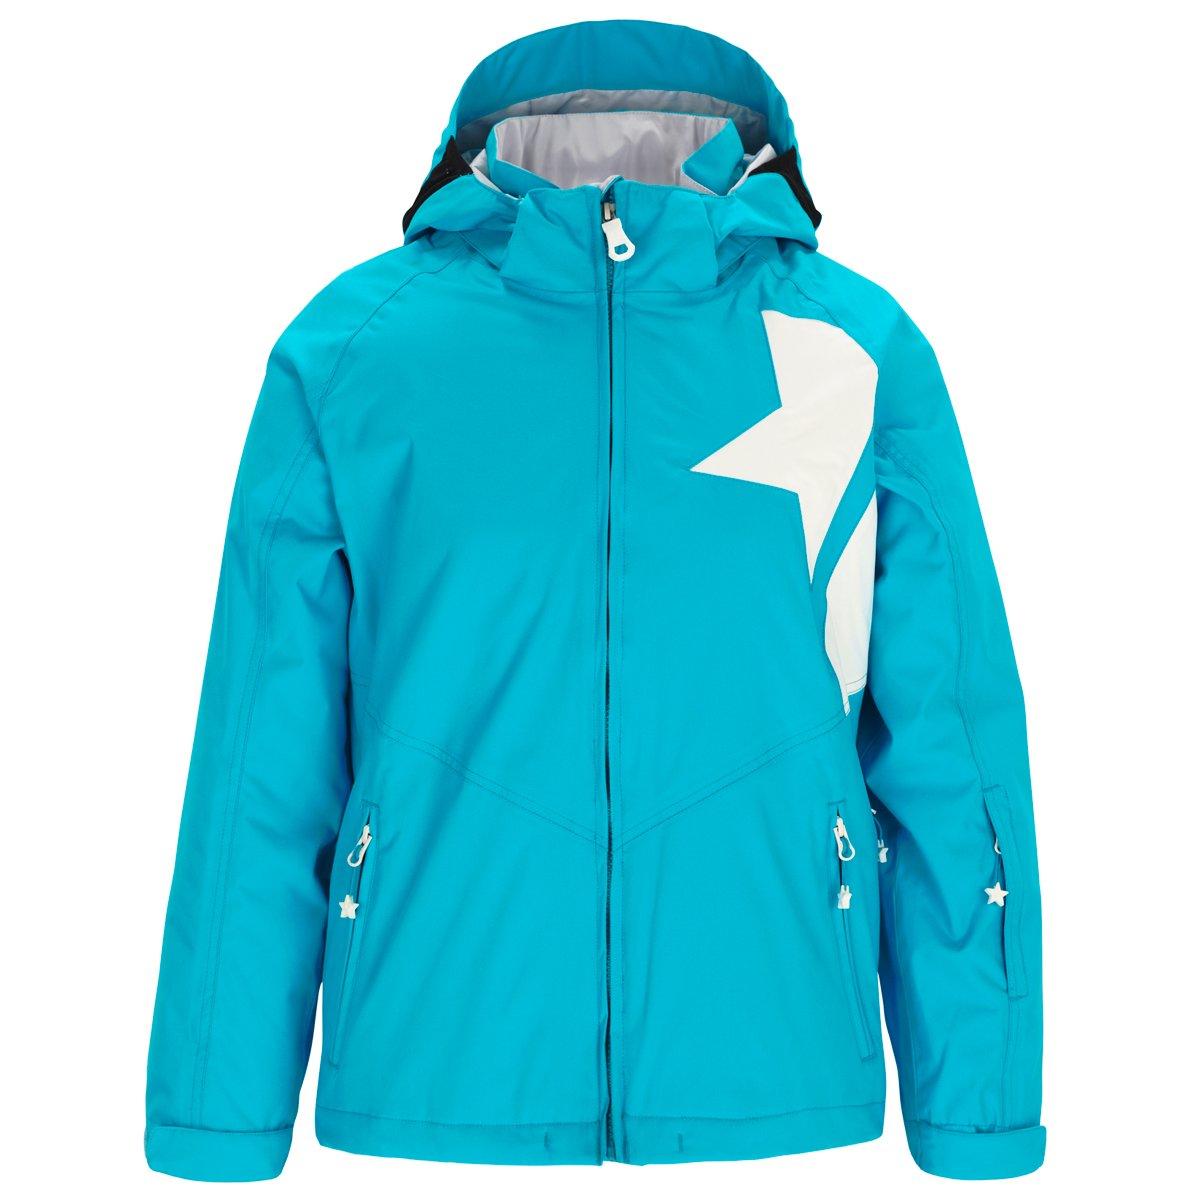 Zimstern Mädchen Snow Jacke Iconic kaufen